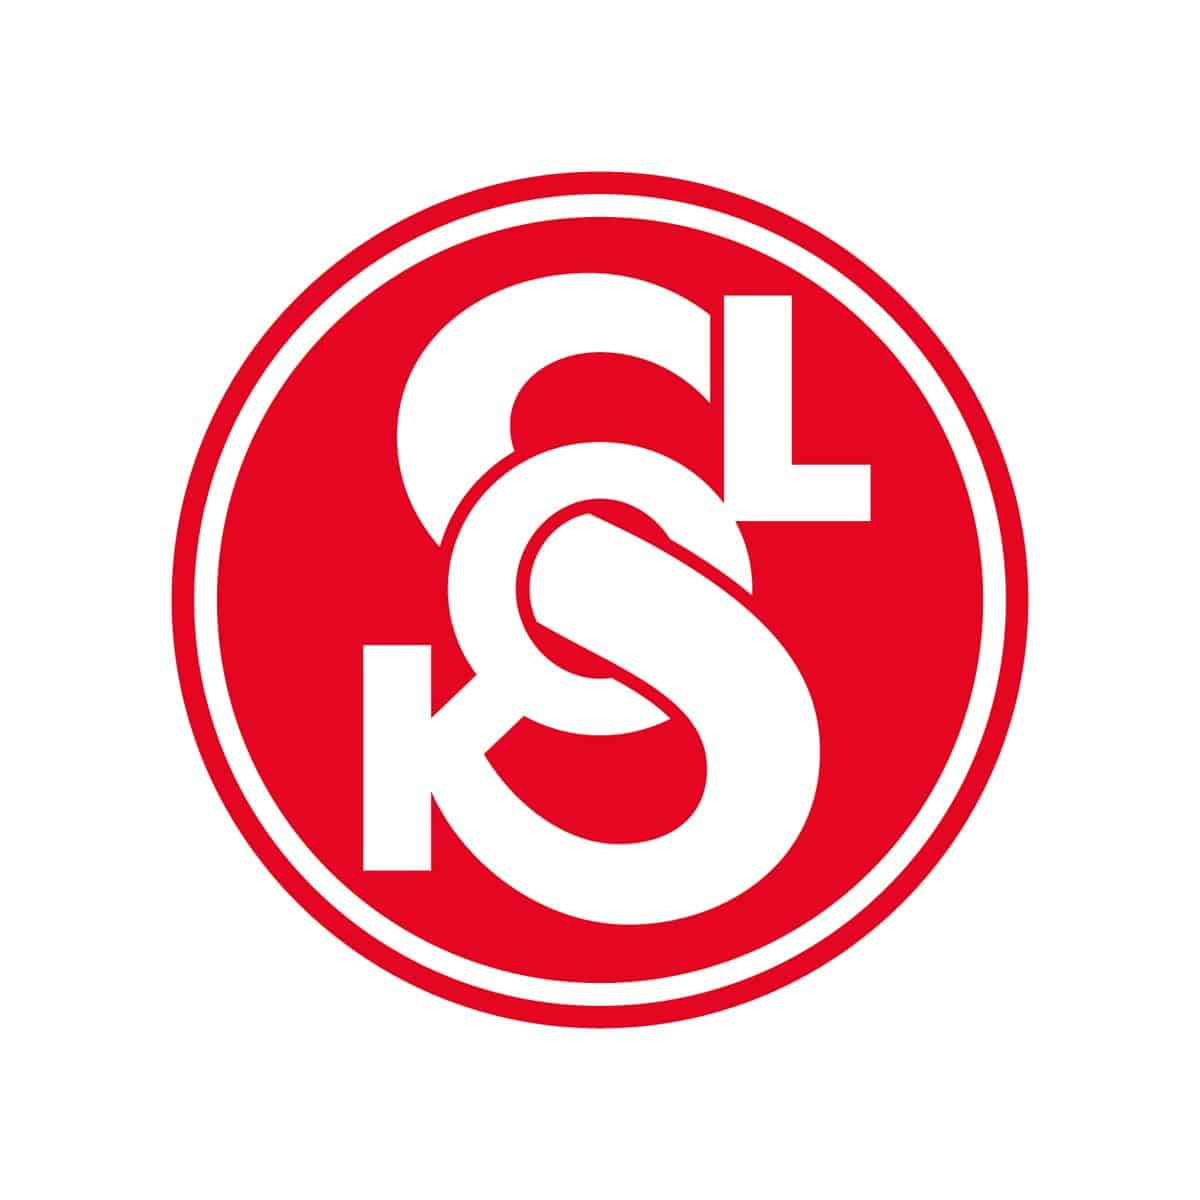 https://www.sokoljulianov.cz/wp-content/uploads/2021/09/sokol-logo-dynamo-design-01o.jpg